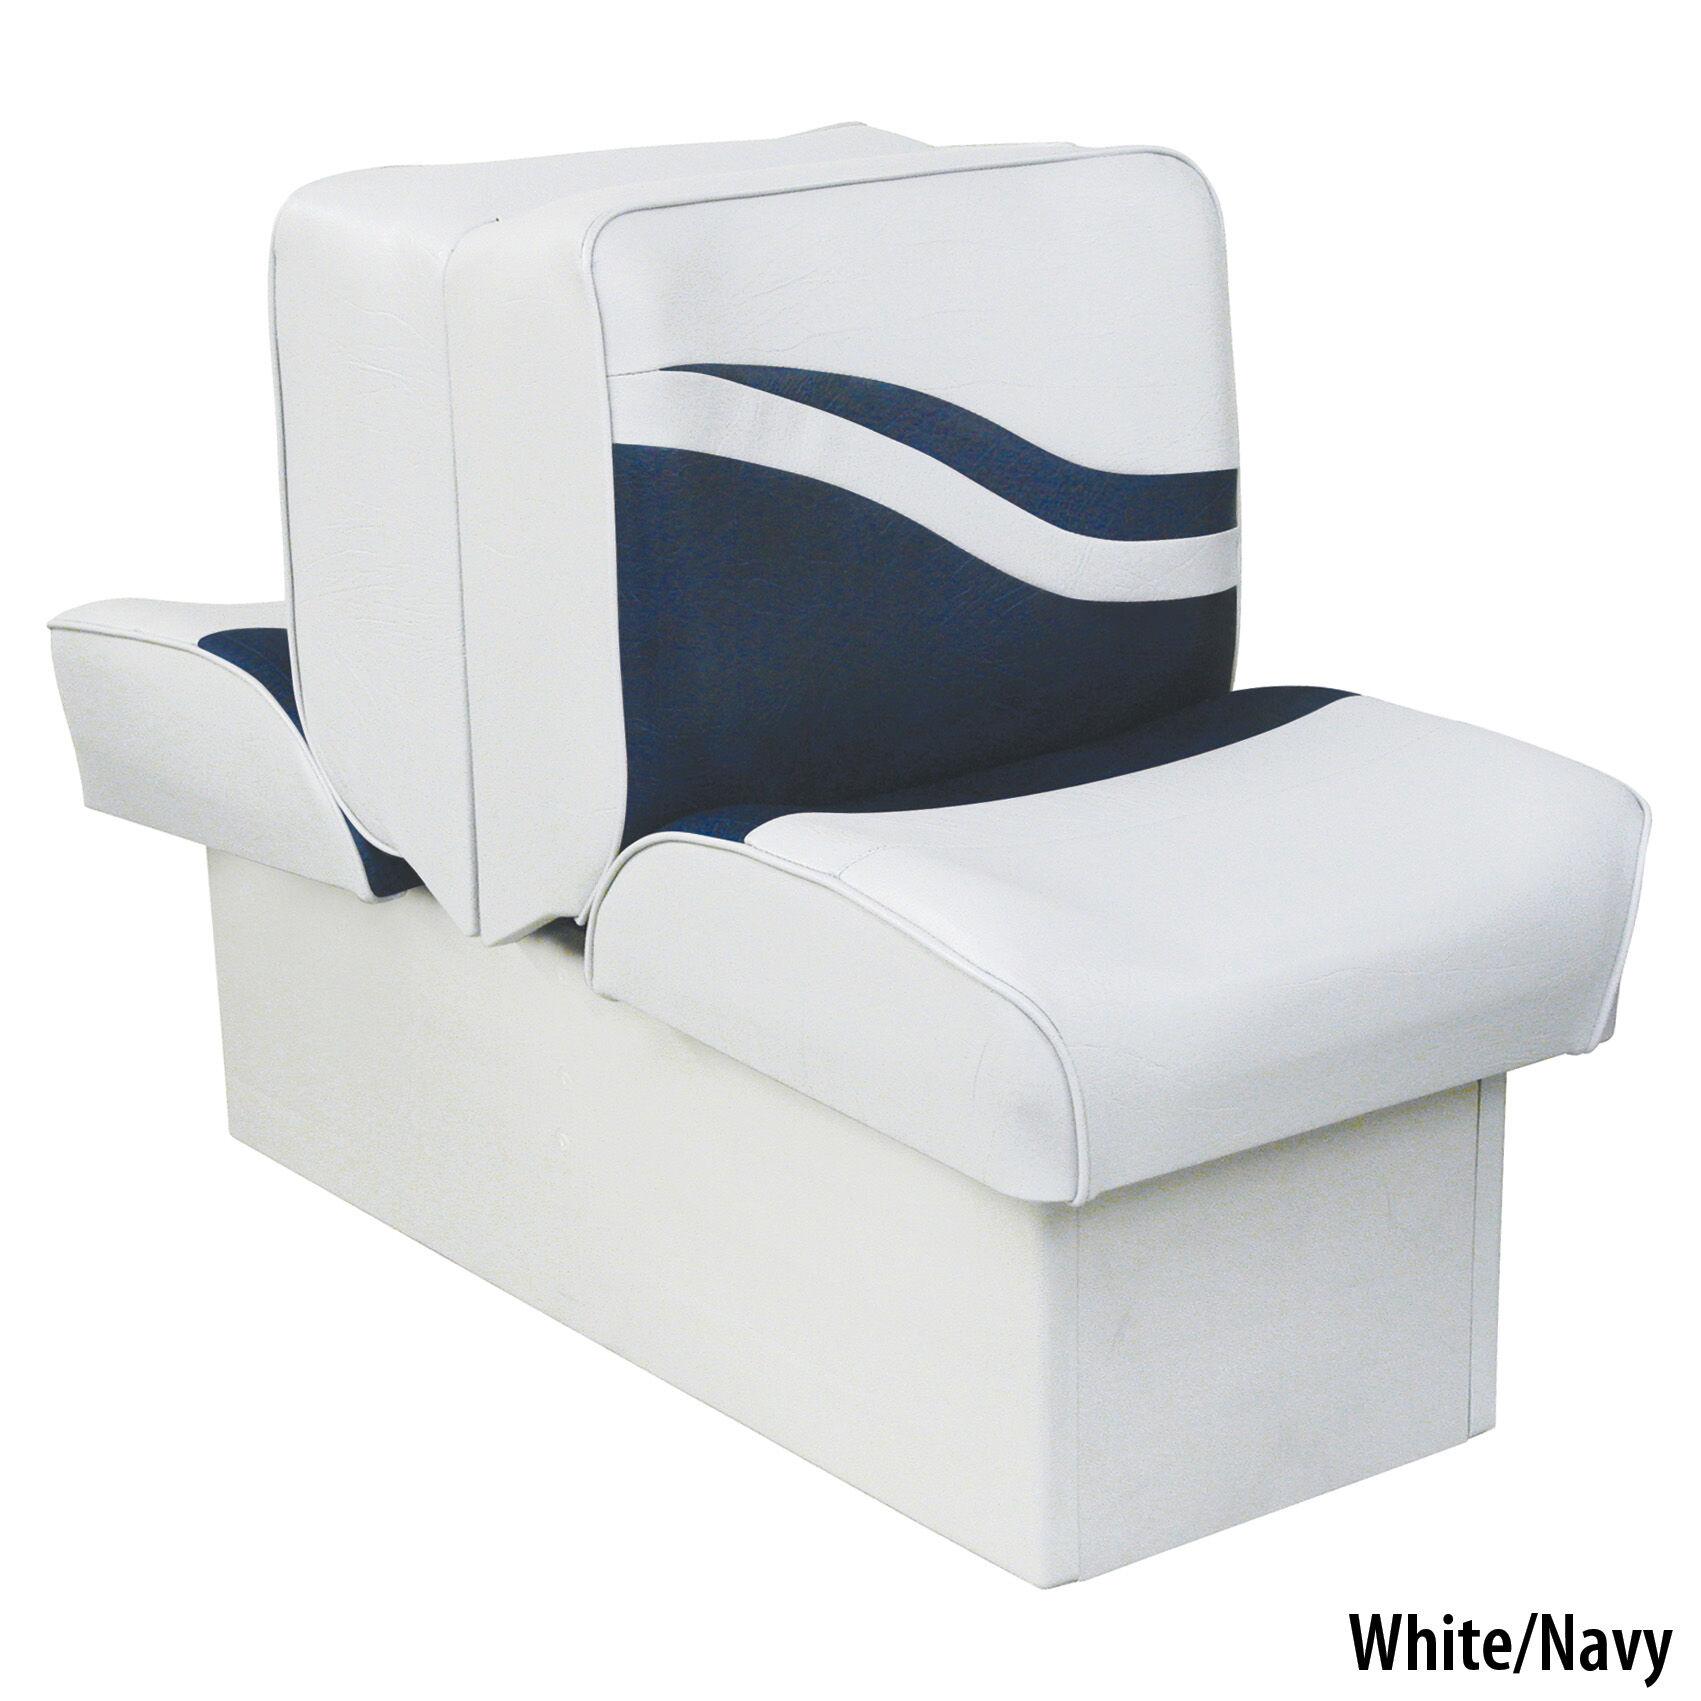 Admirable Boat Seat Back To Back 10 Base Ski Lounge Marine Vinyl Chair Uwap Interior Chair Design Uwaporg